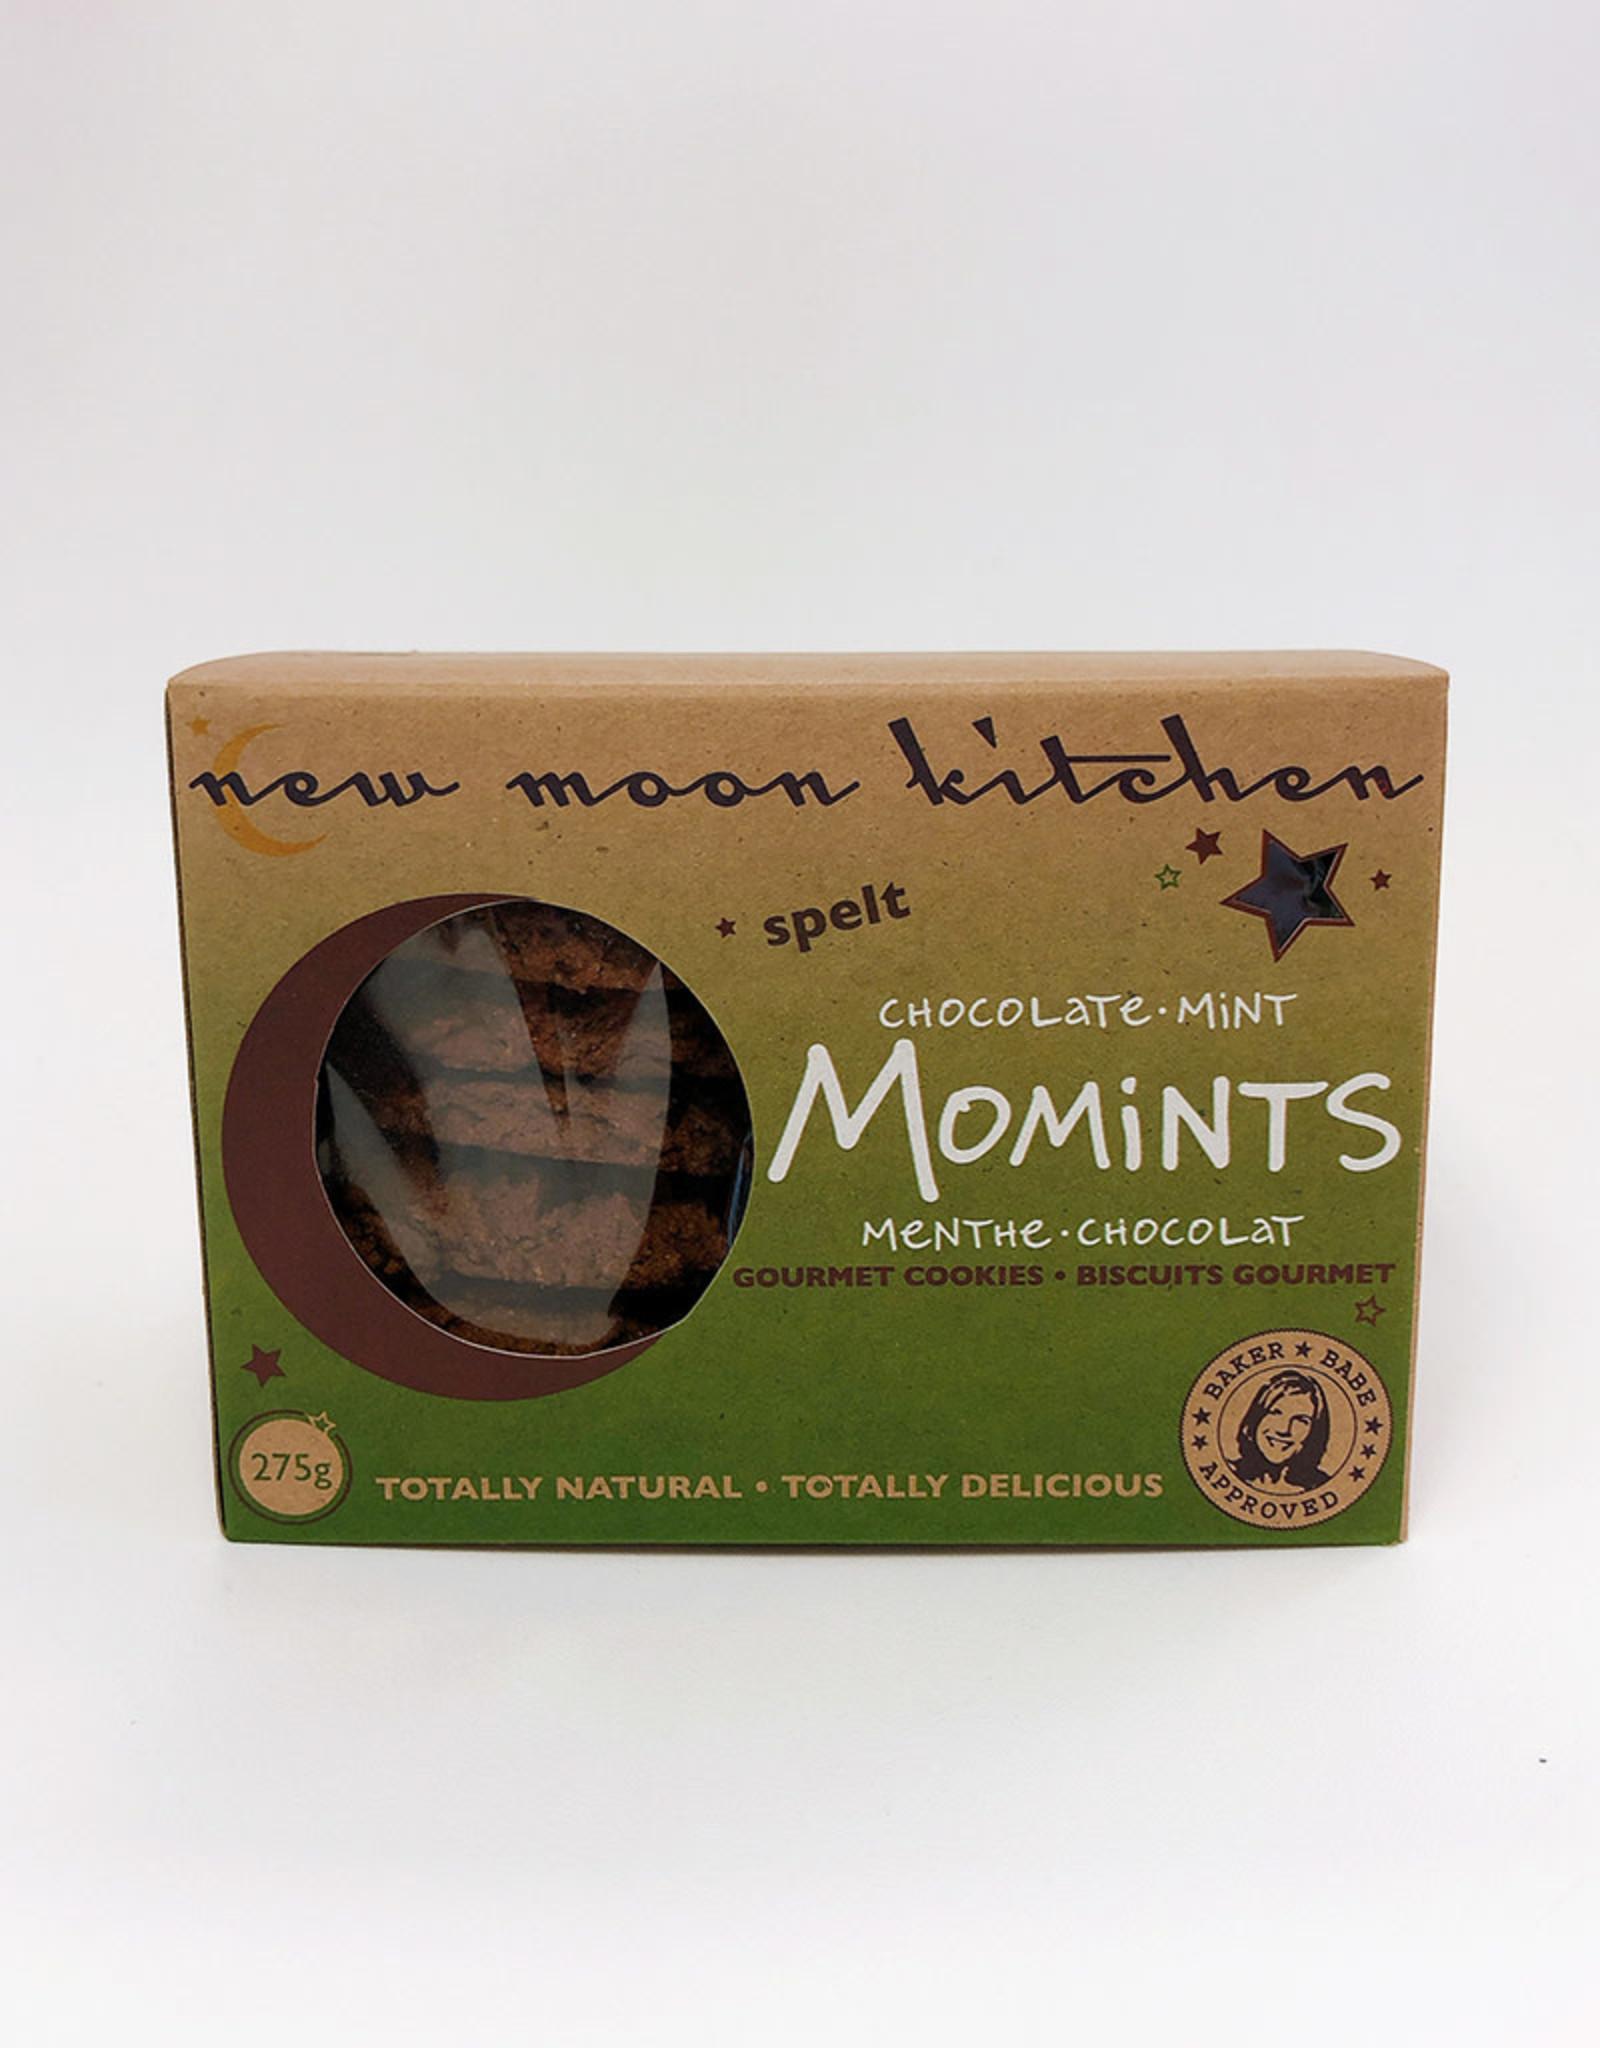 New Moon Kitchen New Moon Kitchen - Cookies, Chocolate Mint Momints (box)